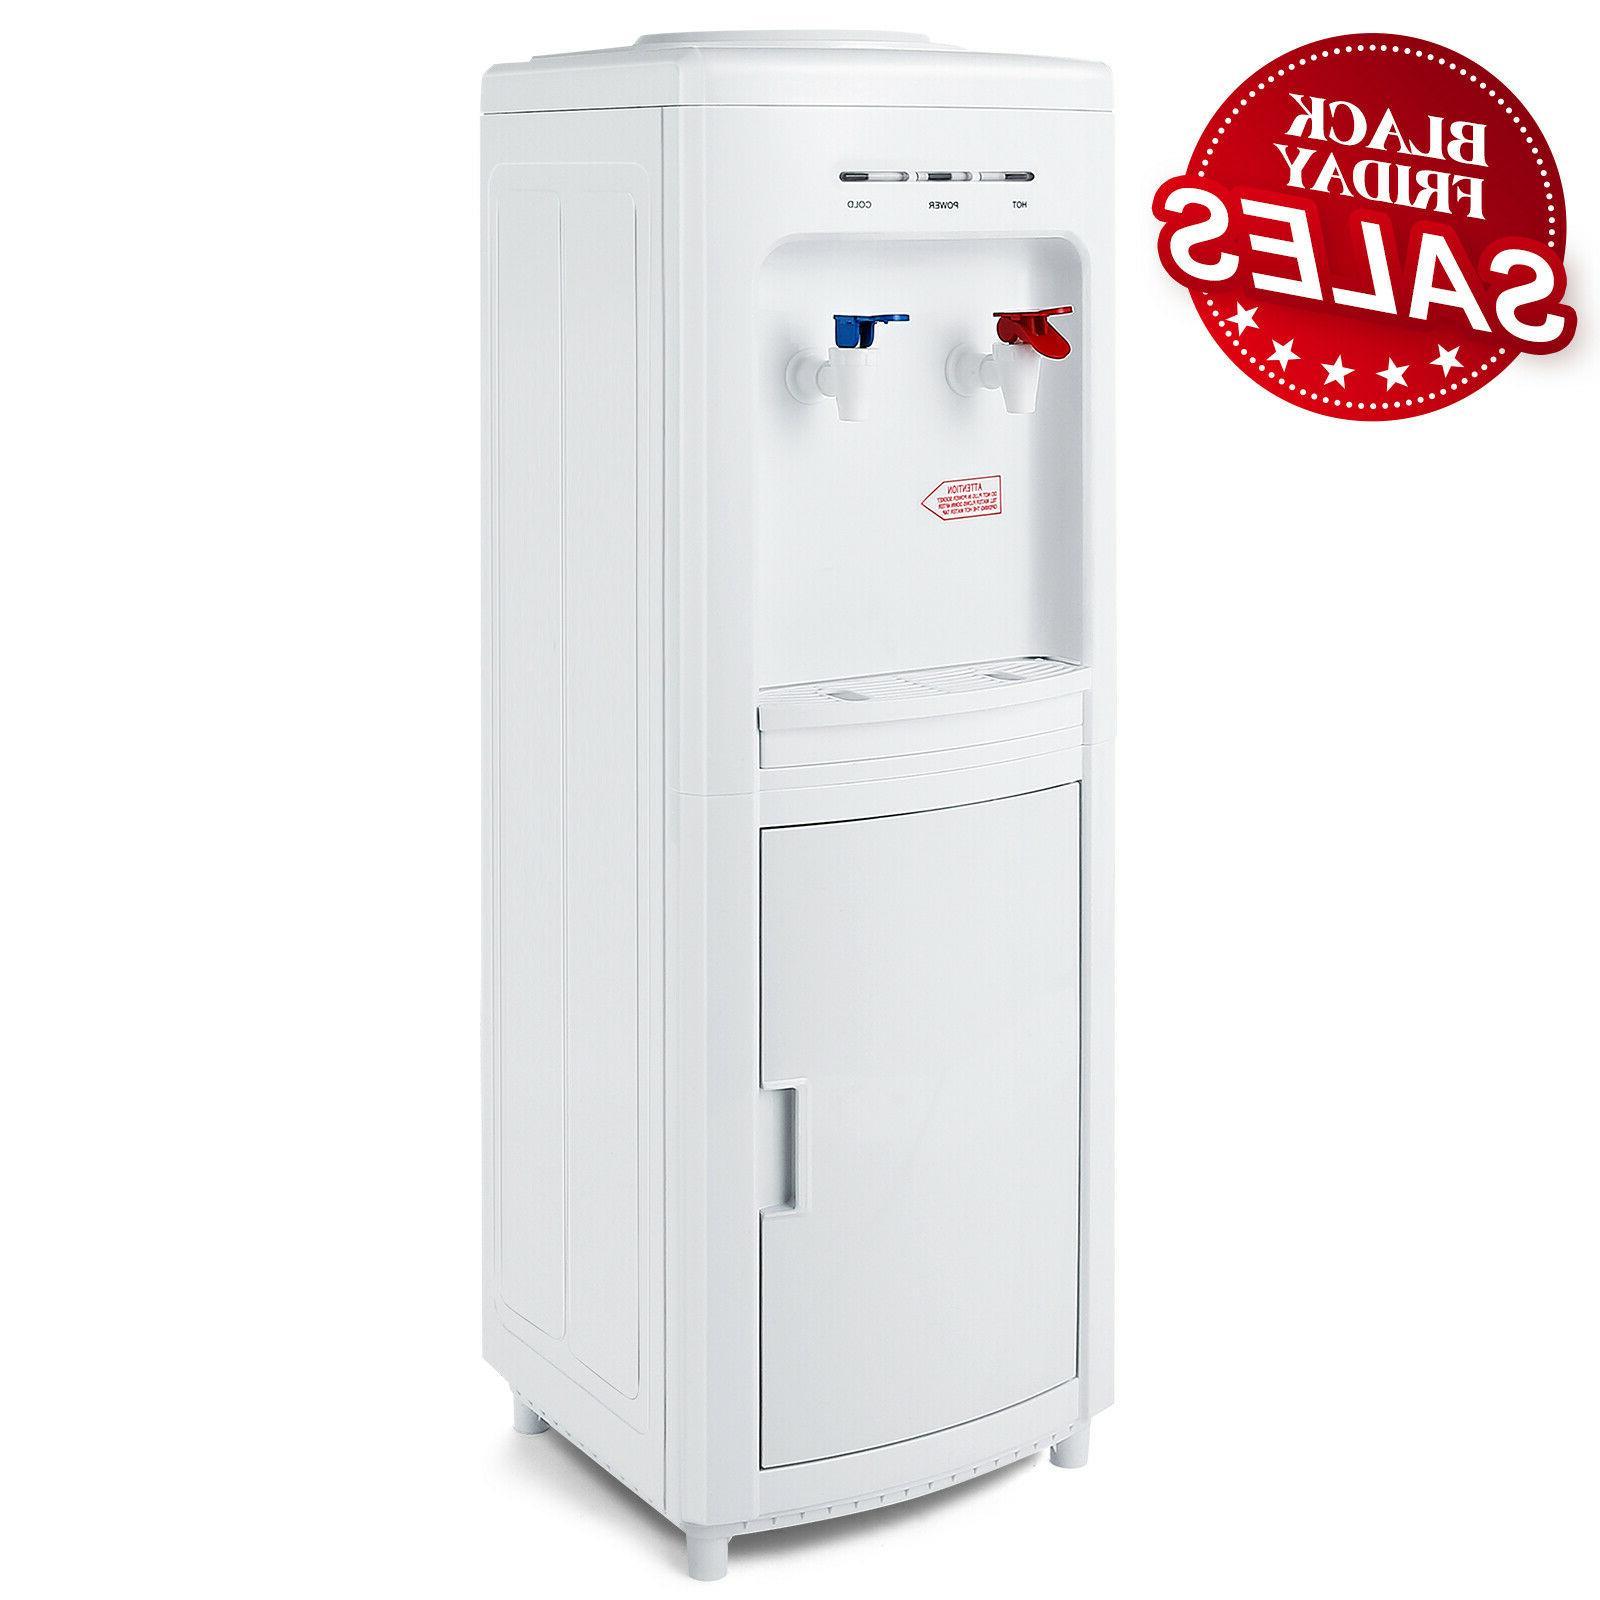 top loading water cooler dispenser freestanding 5